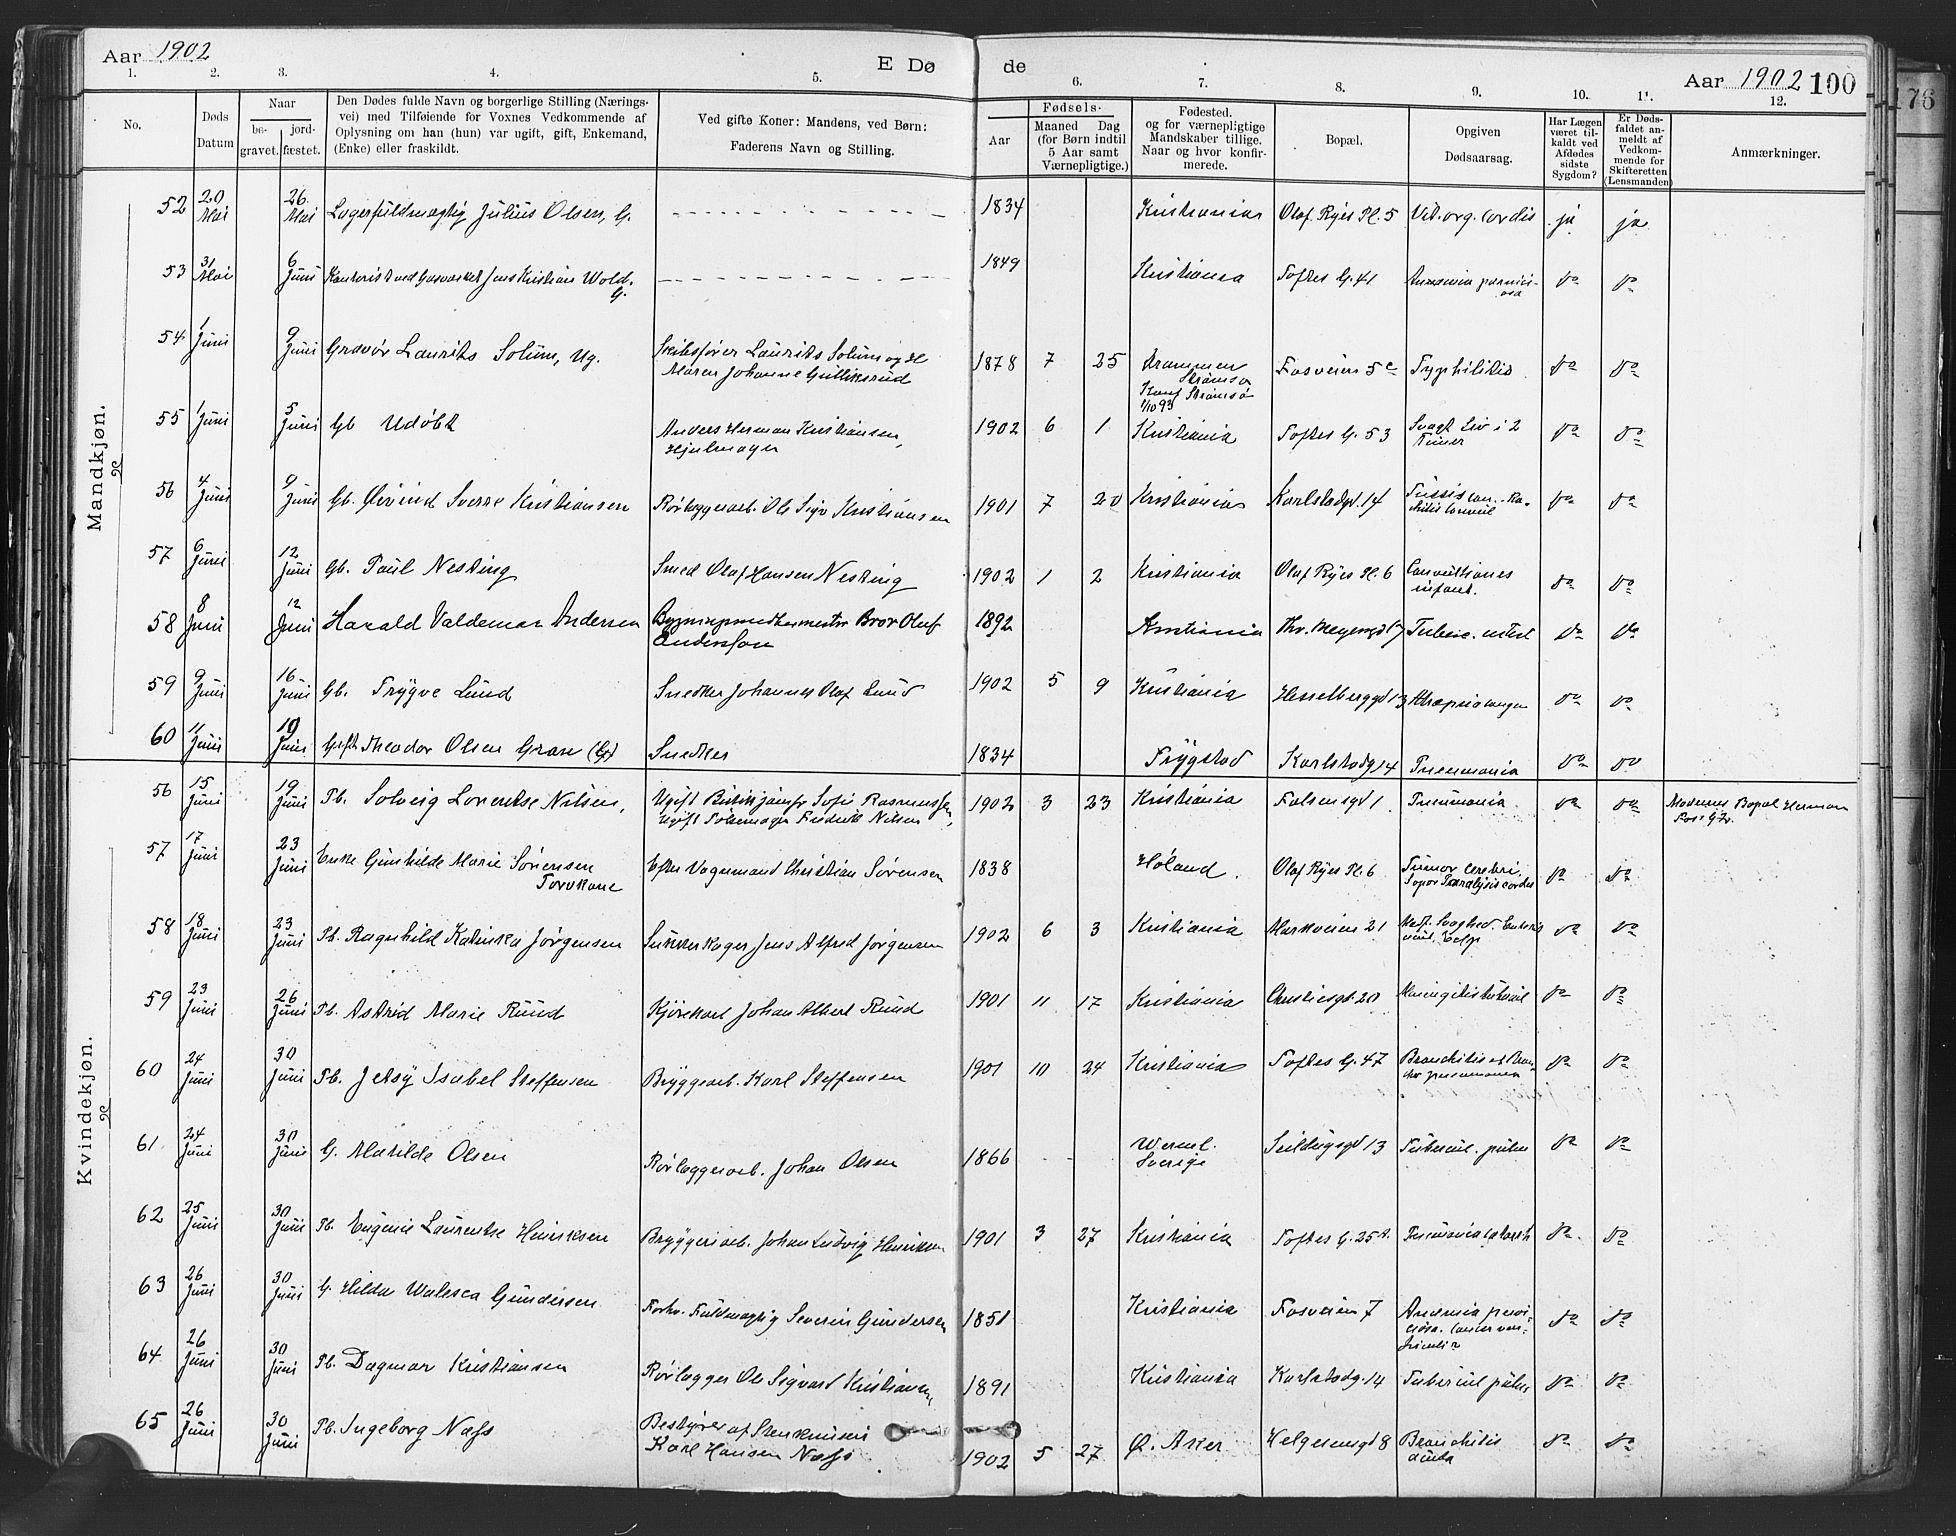 SAO, Paulus prestekontor Kirkebøker, F/Fa/L0012: Ministerialbok nr. 12, 1897-1908, s. 100